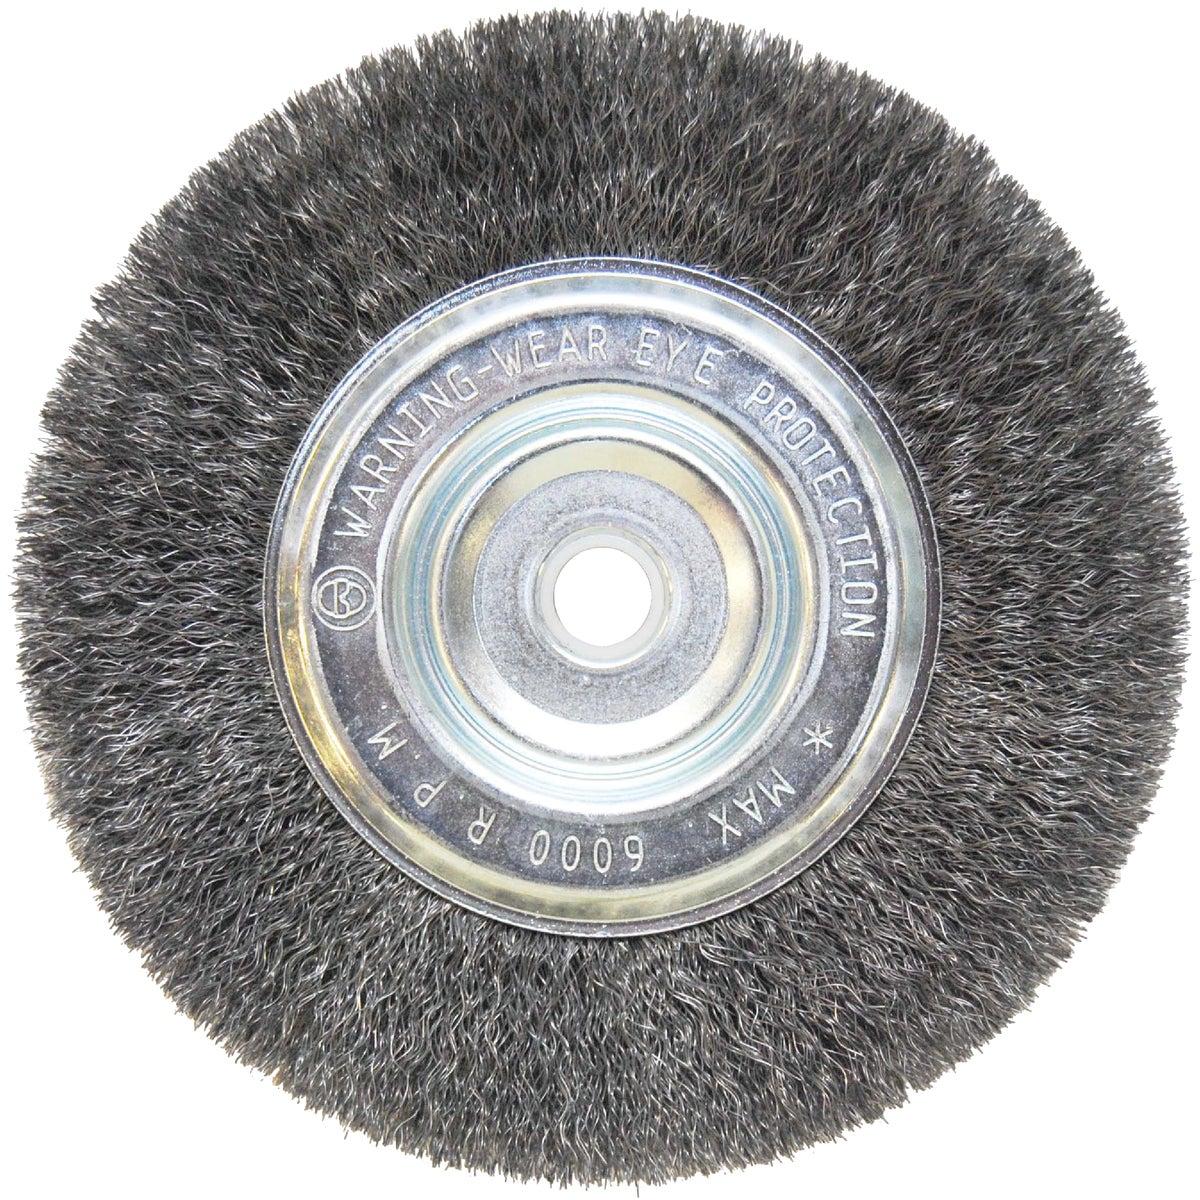 Weiler Brush 6